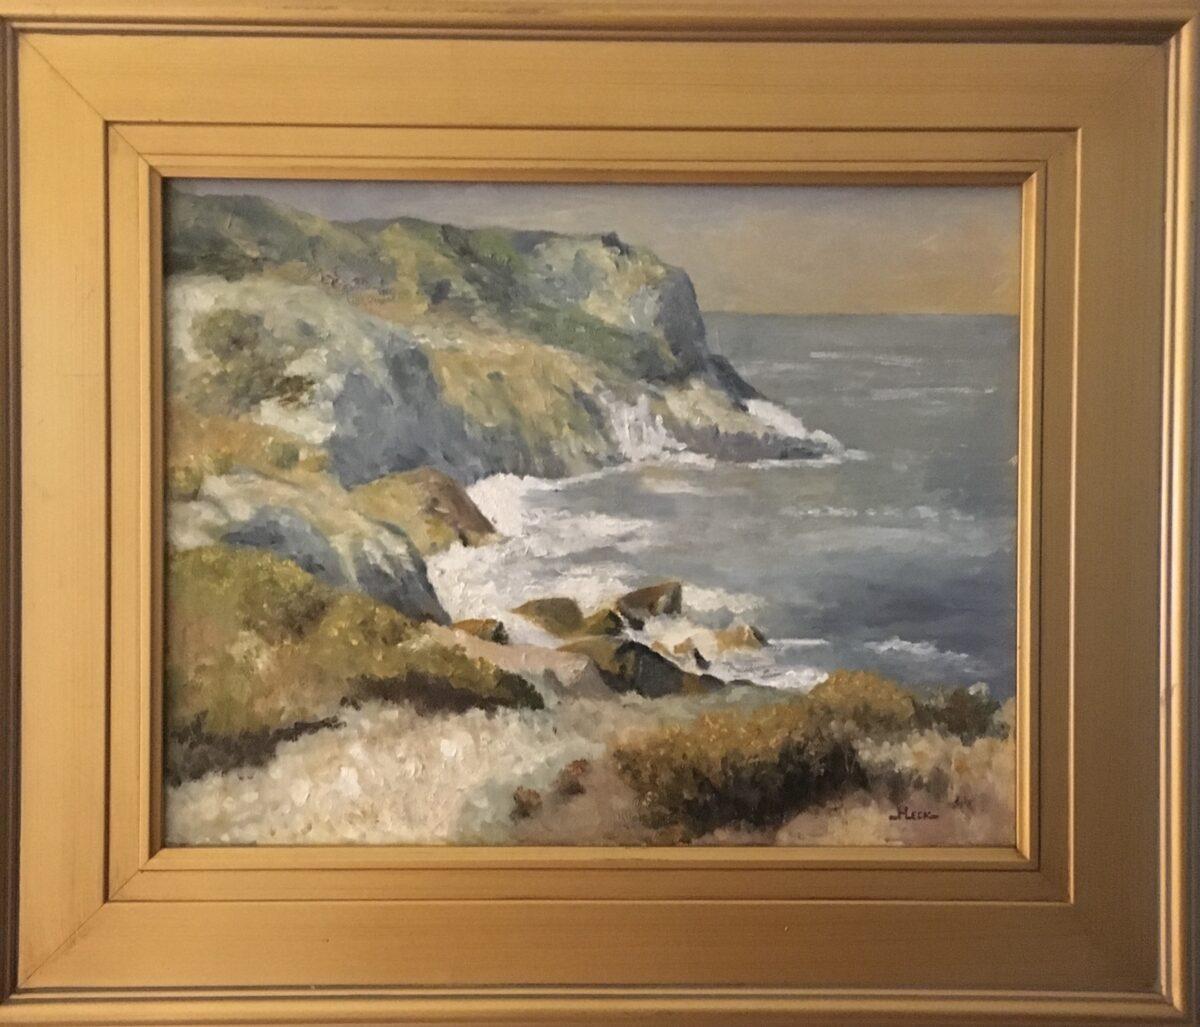 107 - Ocean Side - 11 x 14 - Seascape103 - Sisters - 16 x 20 - Portrait - Not Available